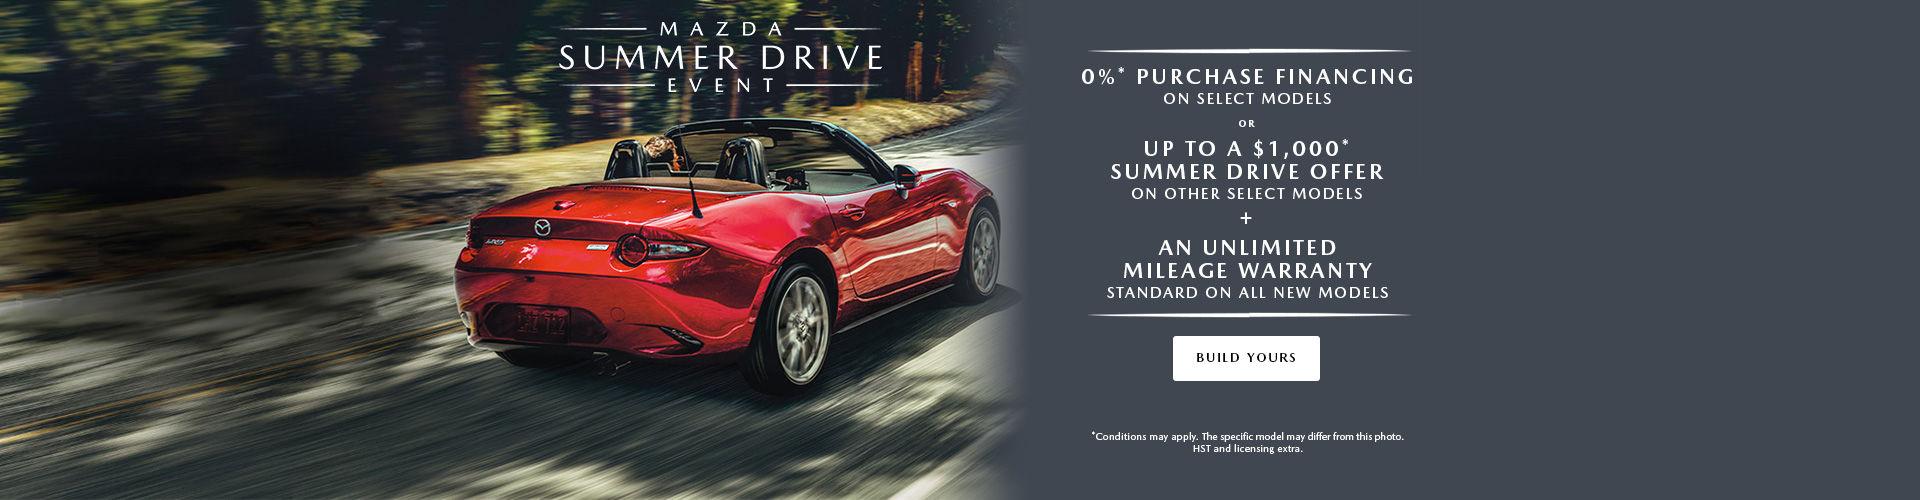 Summer Drive Event